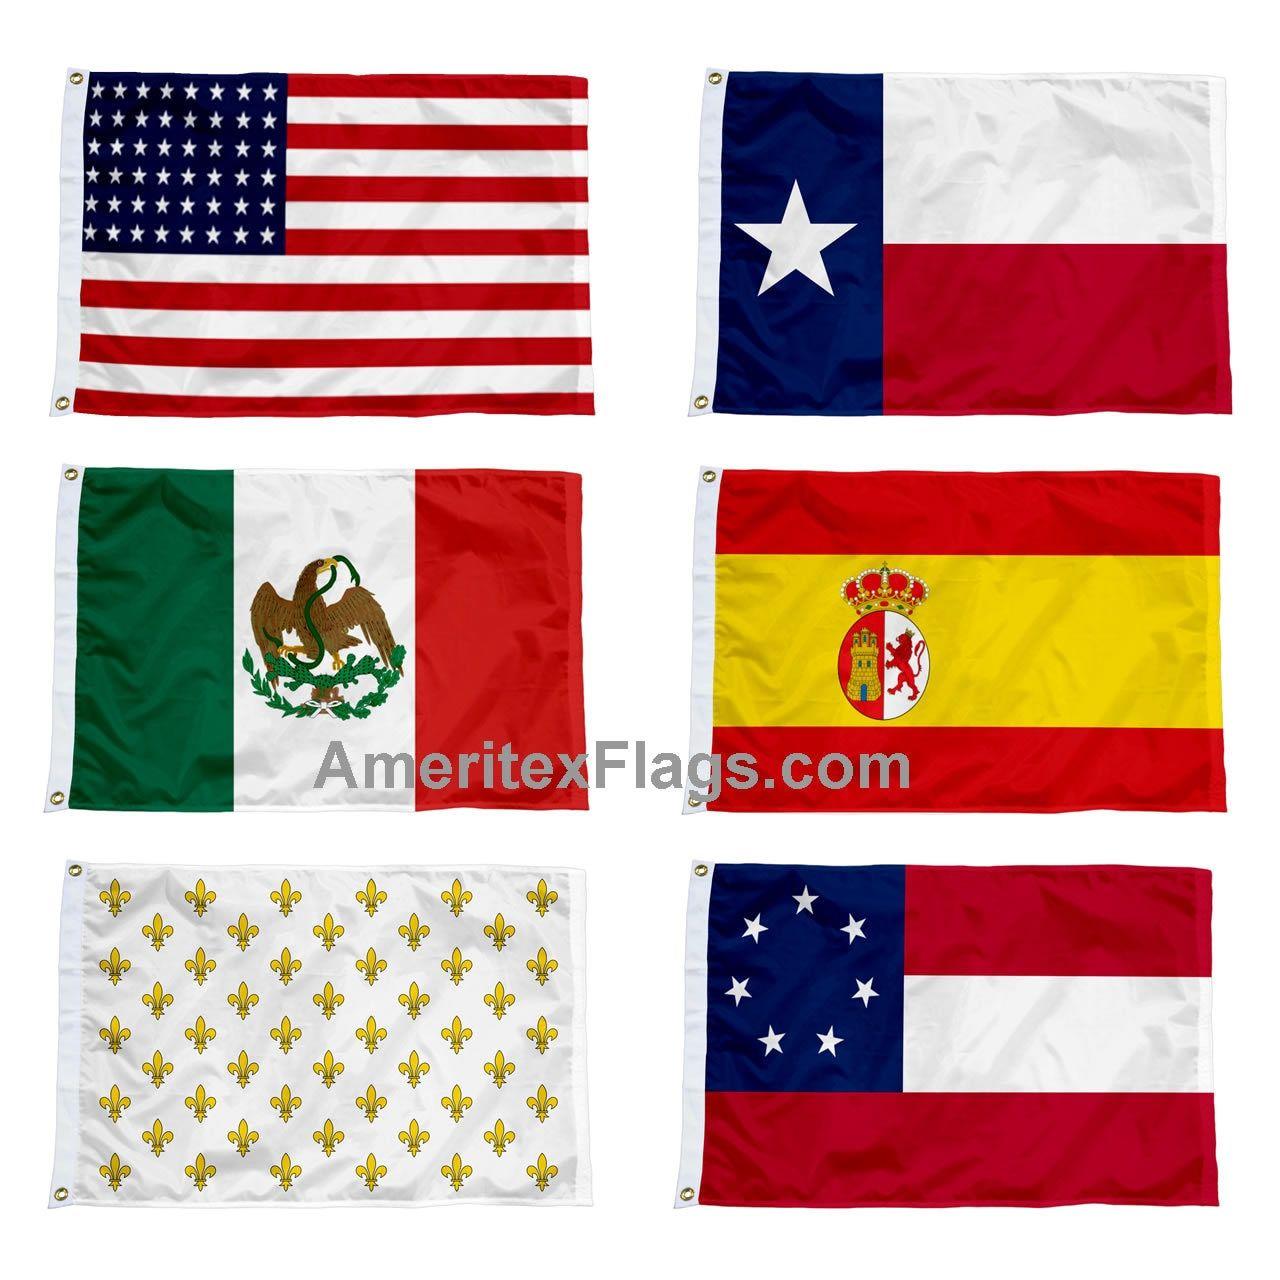 Six Historical Flags Over Texas Historical Flags France Flag Historical